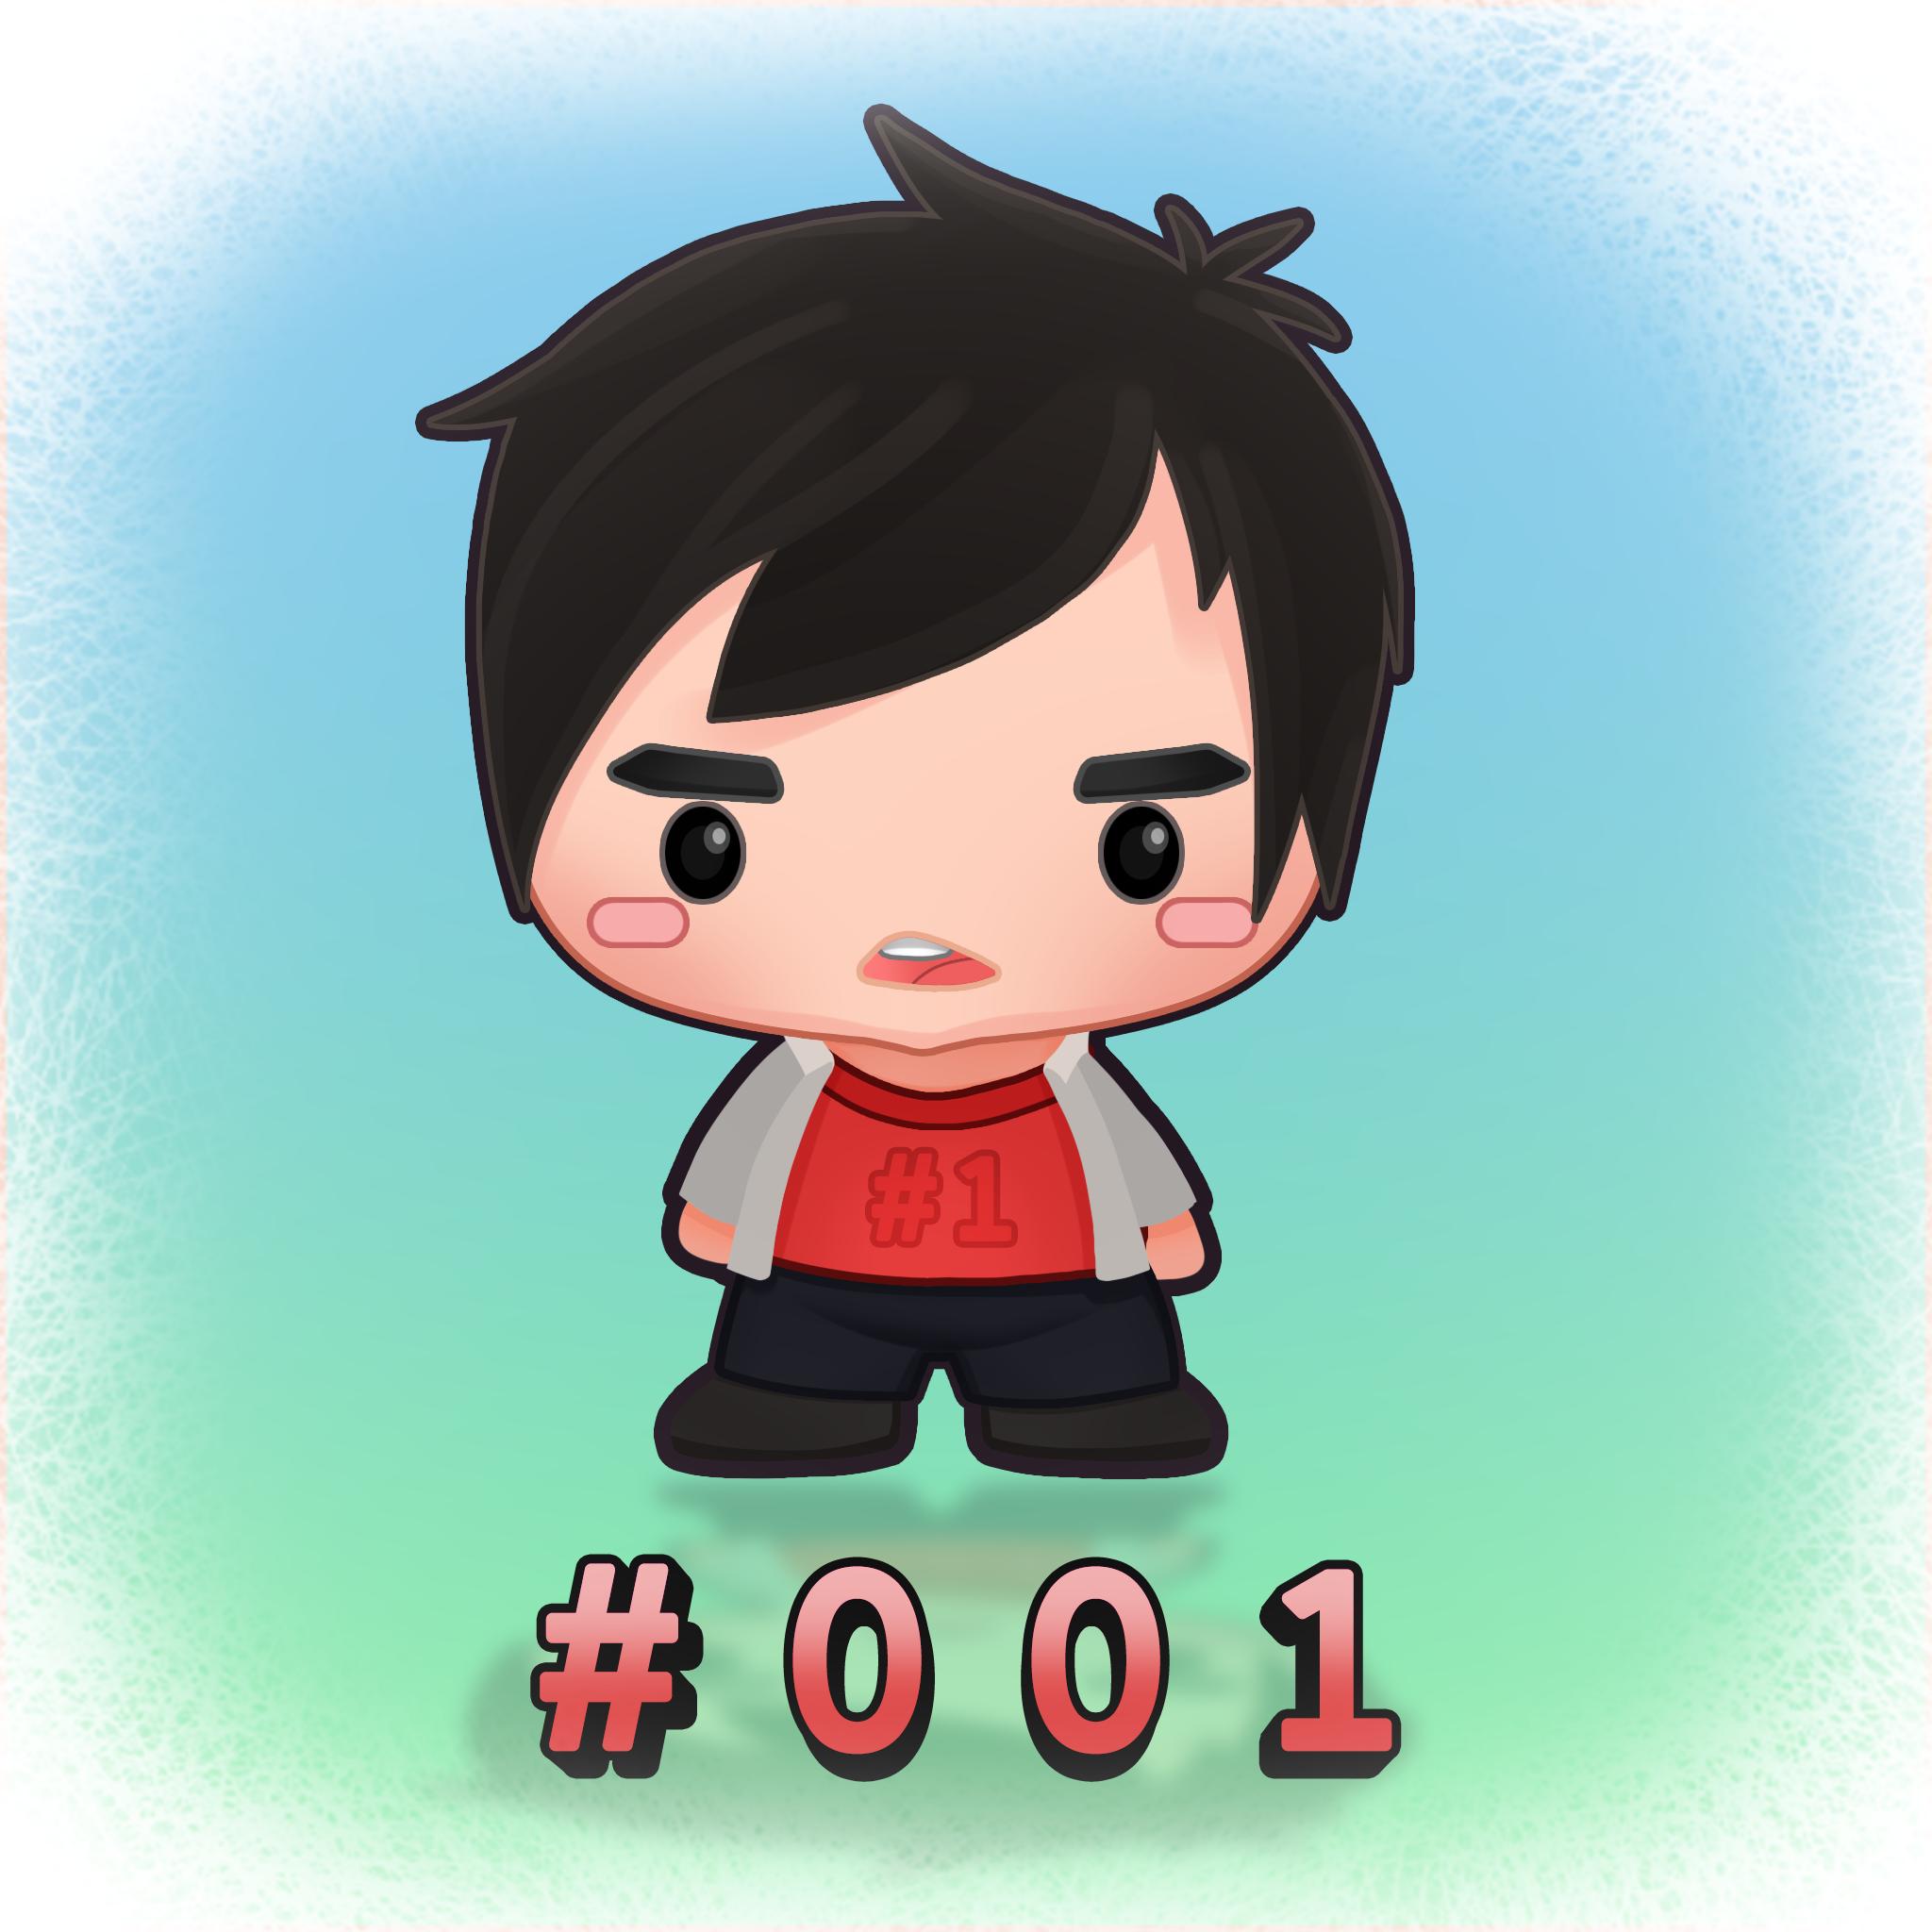 Cute 2D character